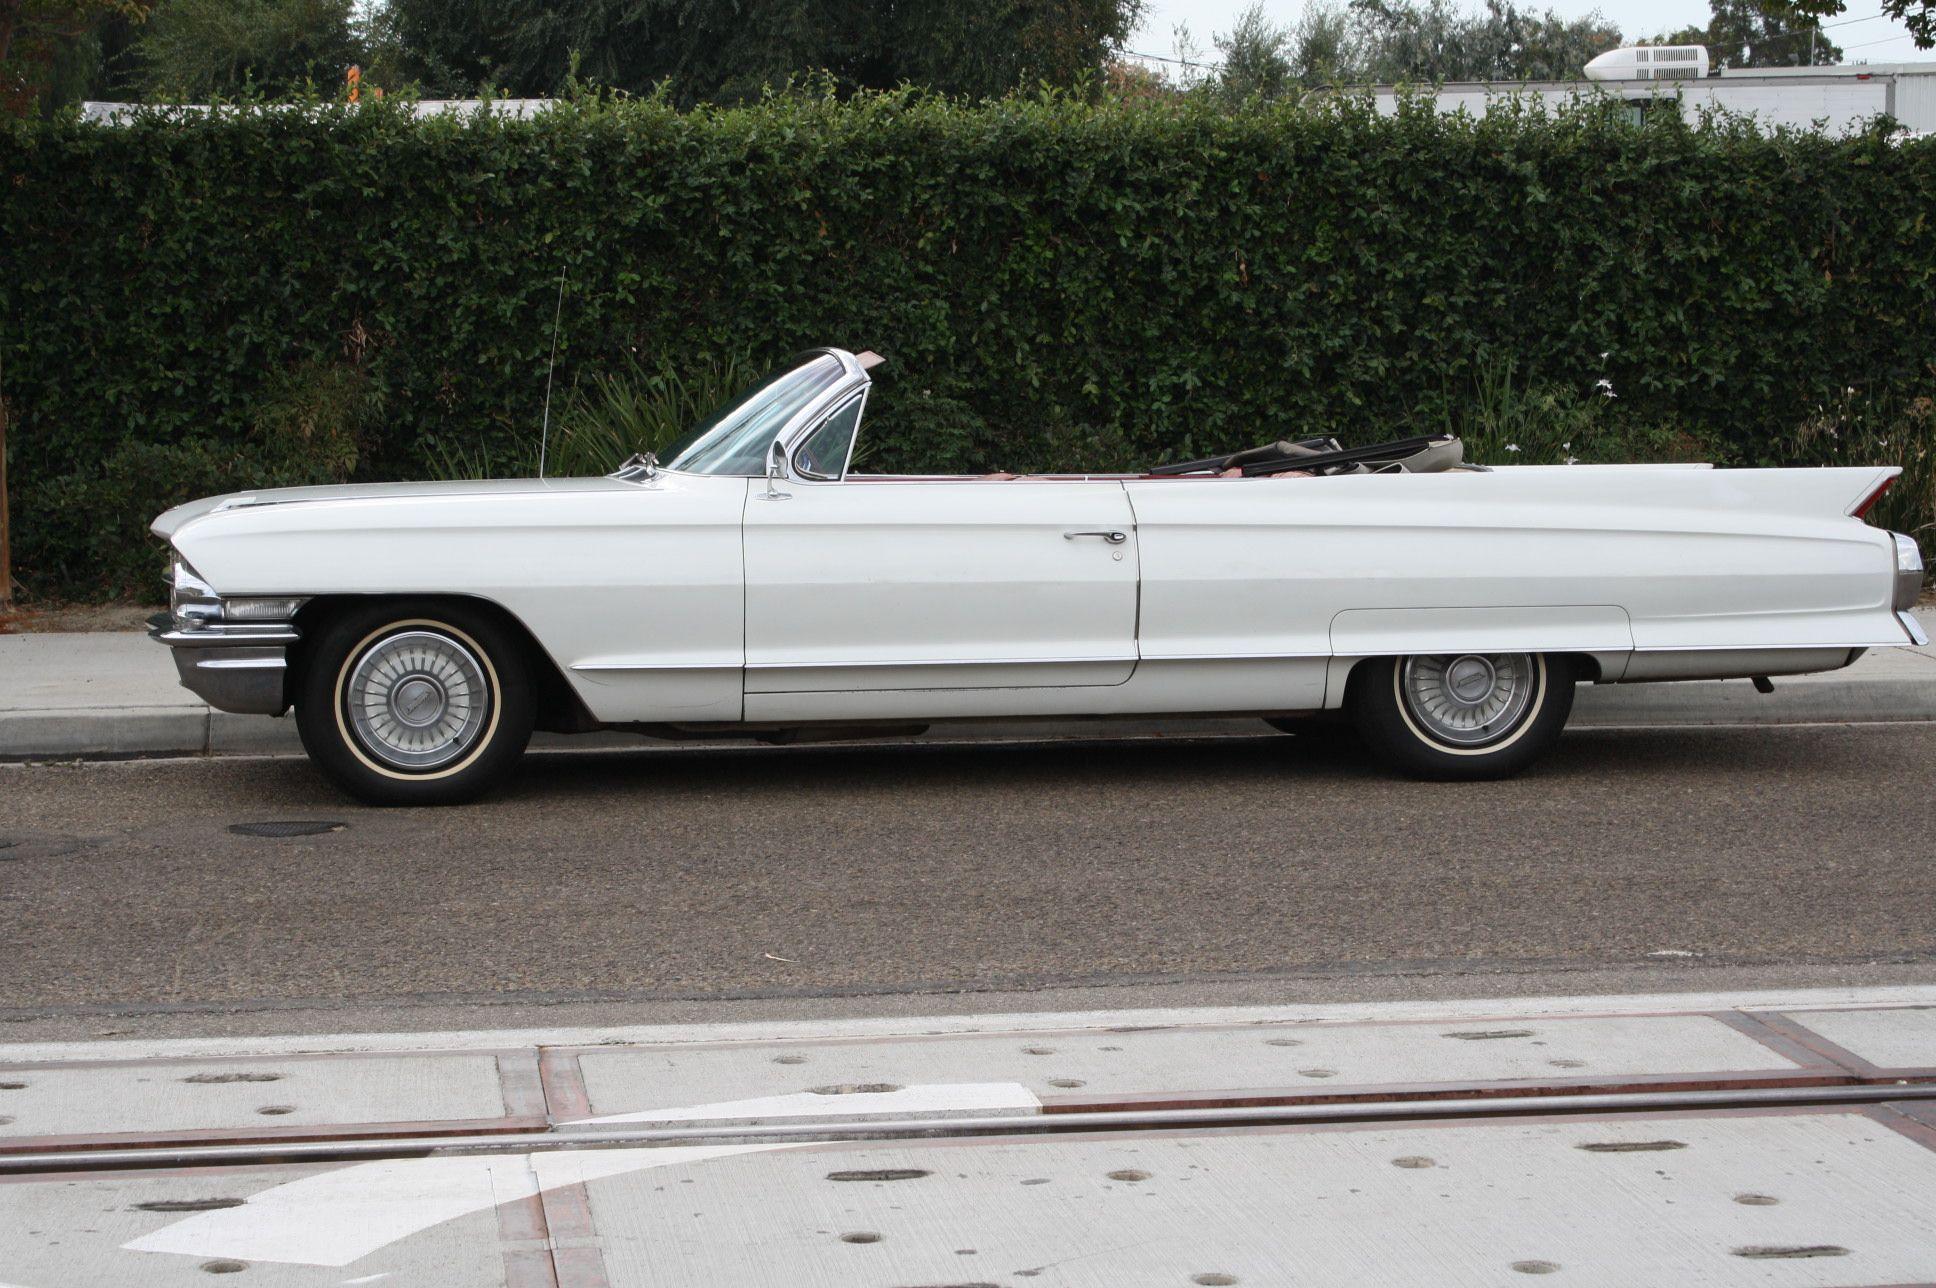 old cadillac cars | Cadillac Classic Cars | Old ♥Cadillac ...